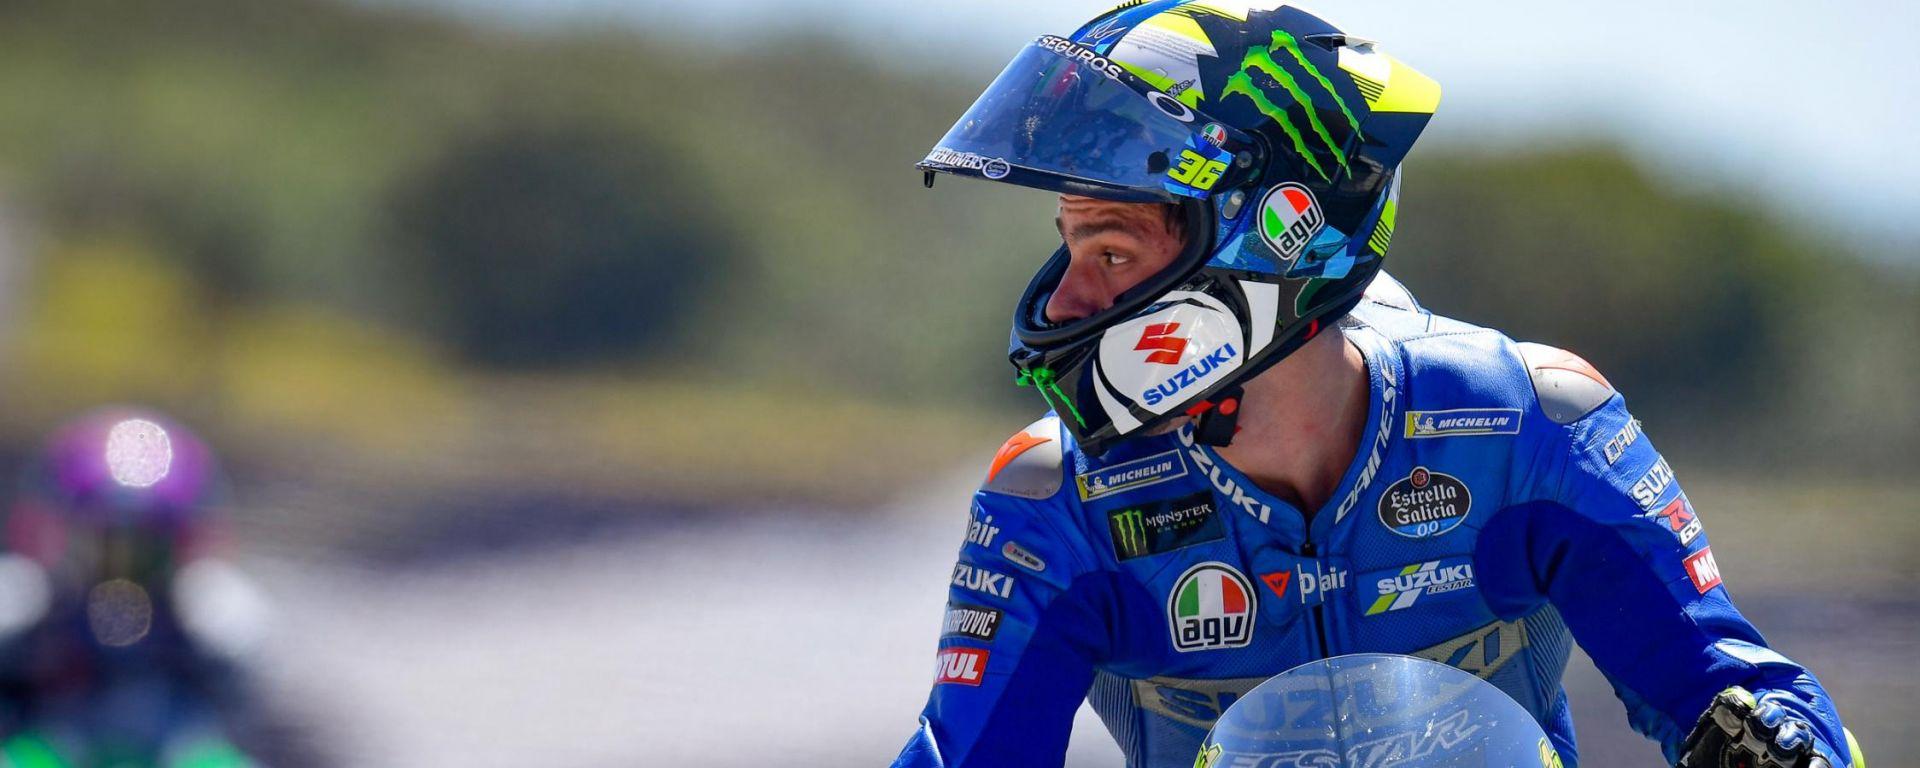 MotoGP, GP Portogallo 2021: Joan Mir (Suzuki)